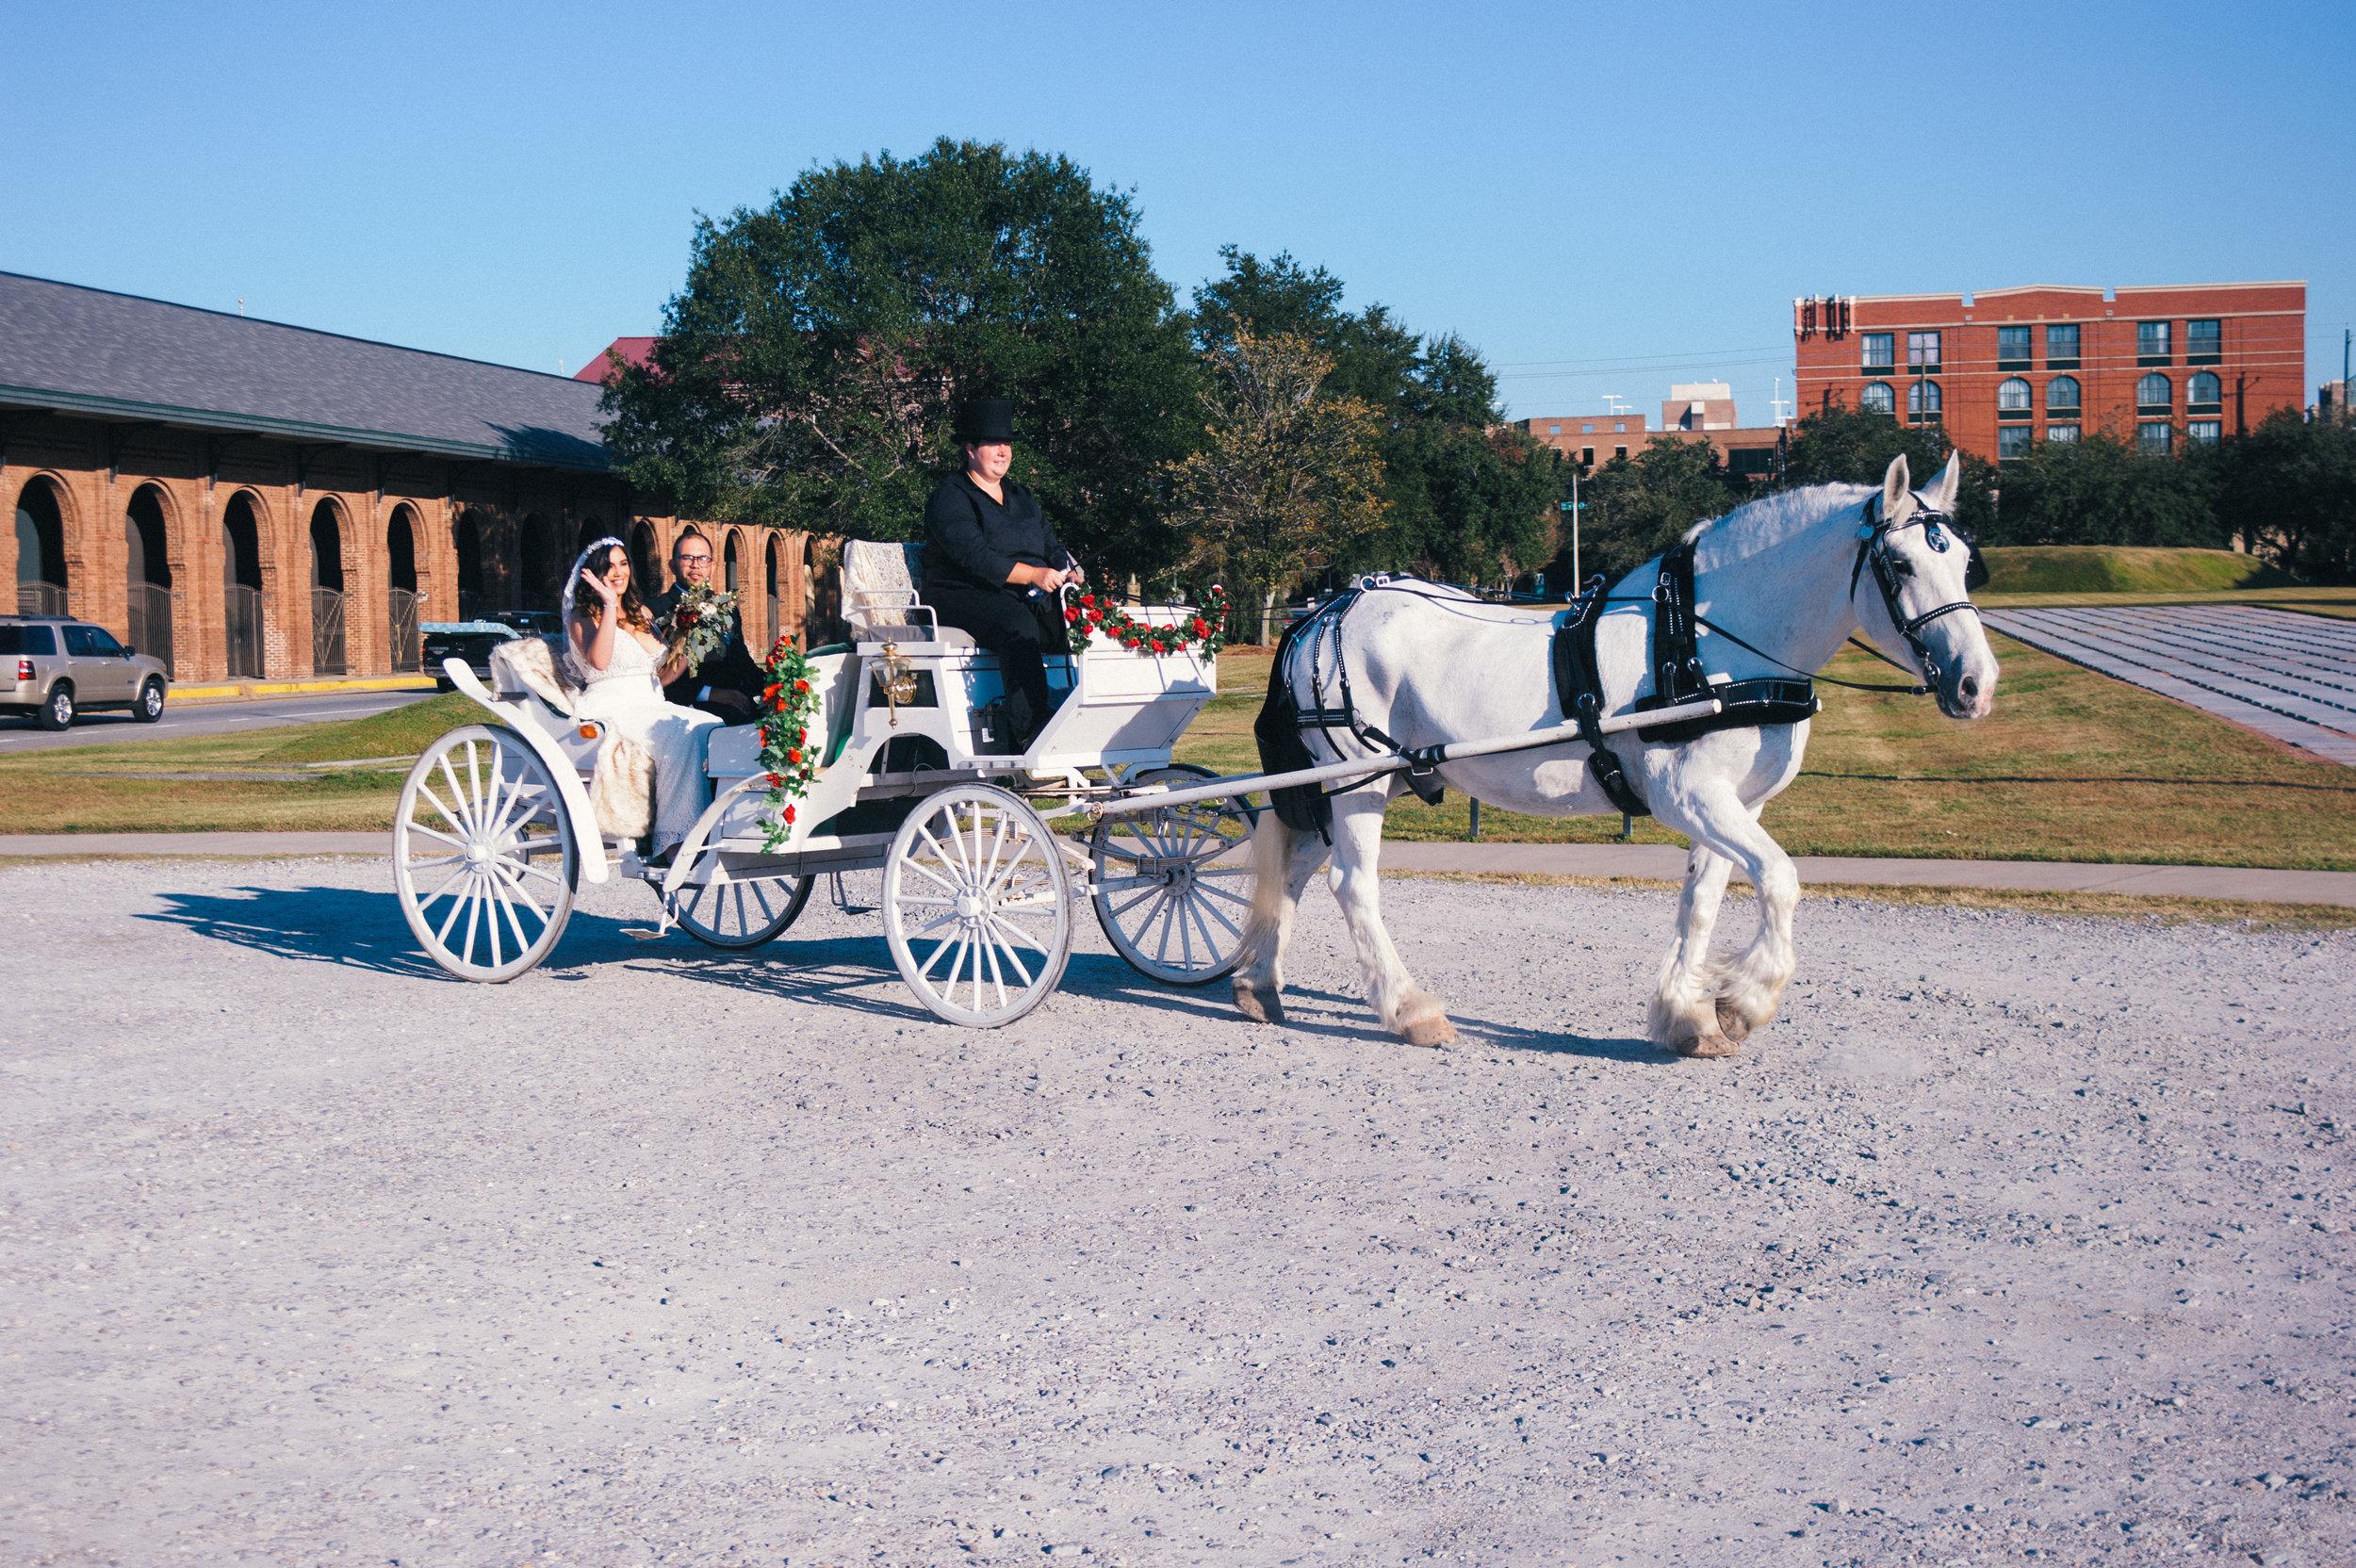 Iggy-and-yesenia-savannah-railroad-museum-wedding-meg-hill-photo- (334 of 866).jpg